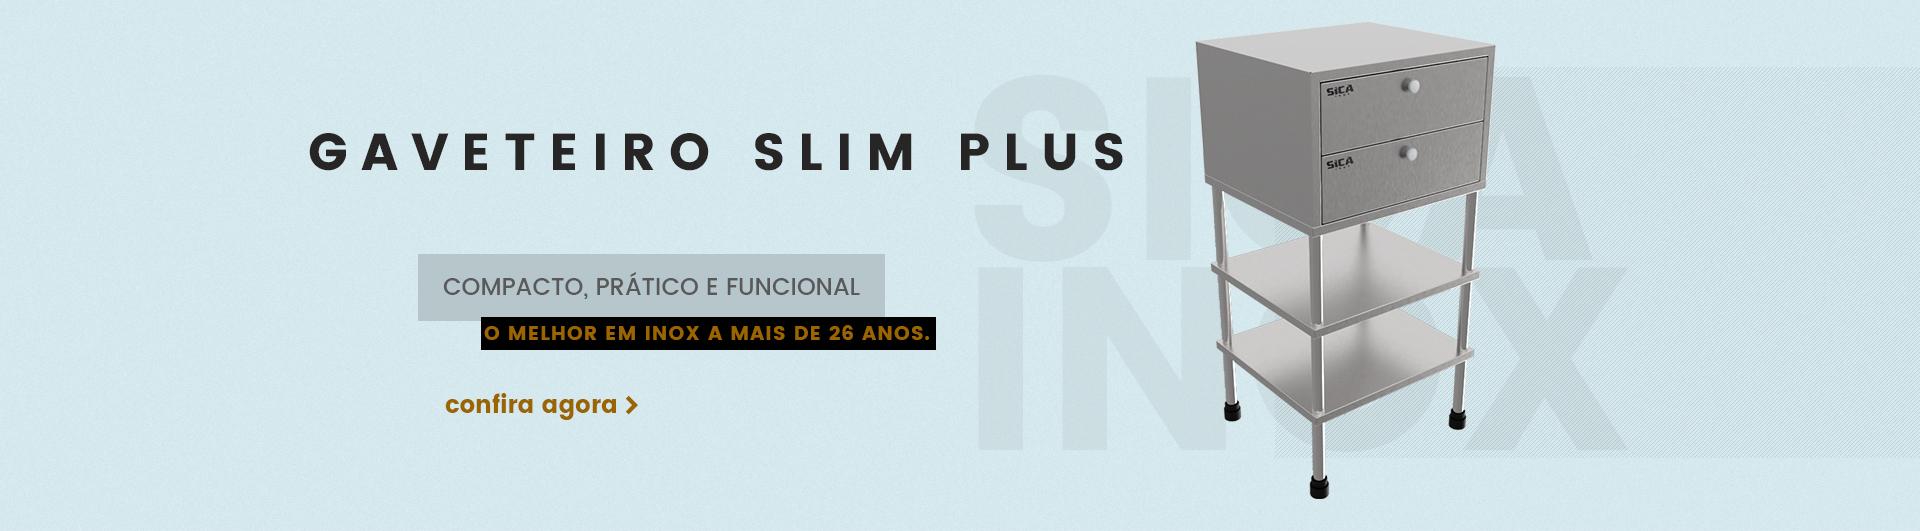 Gaveteiro Slim Plus